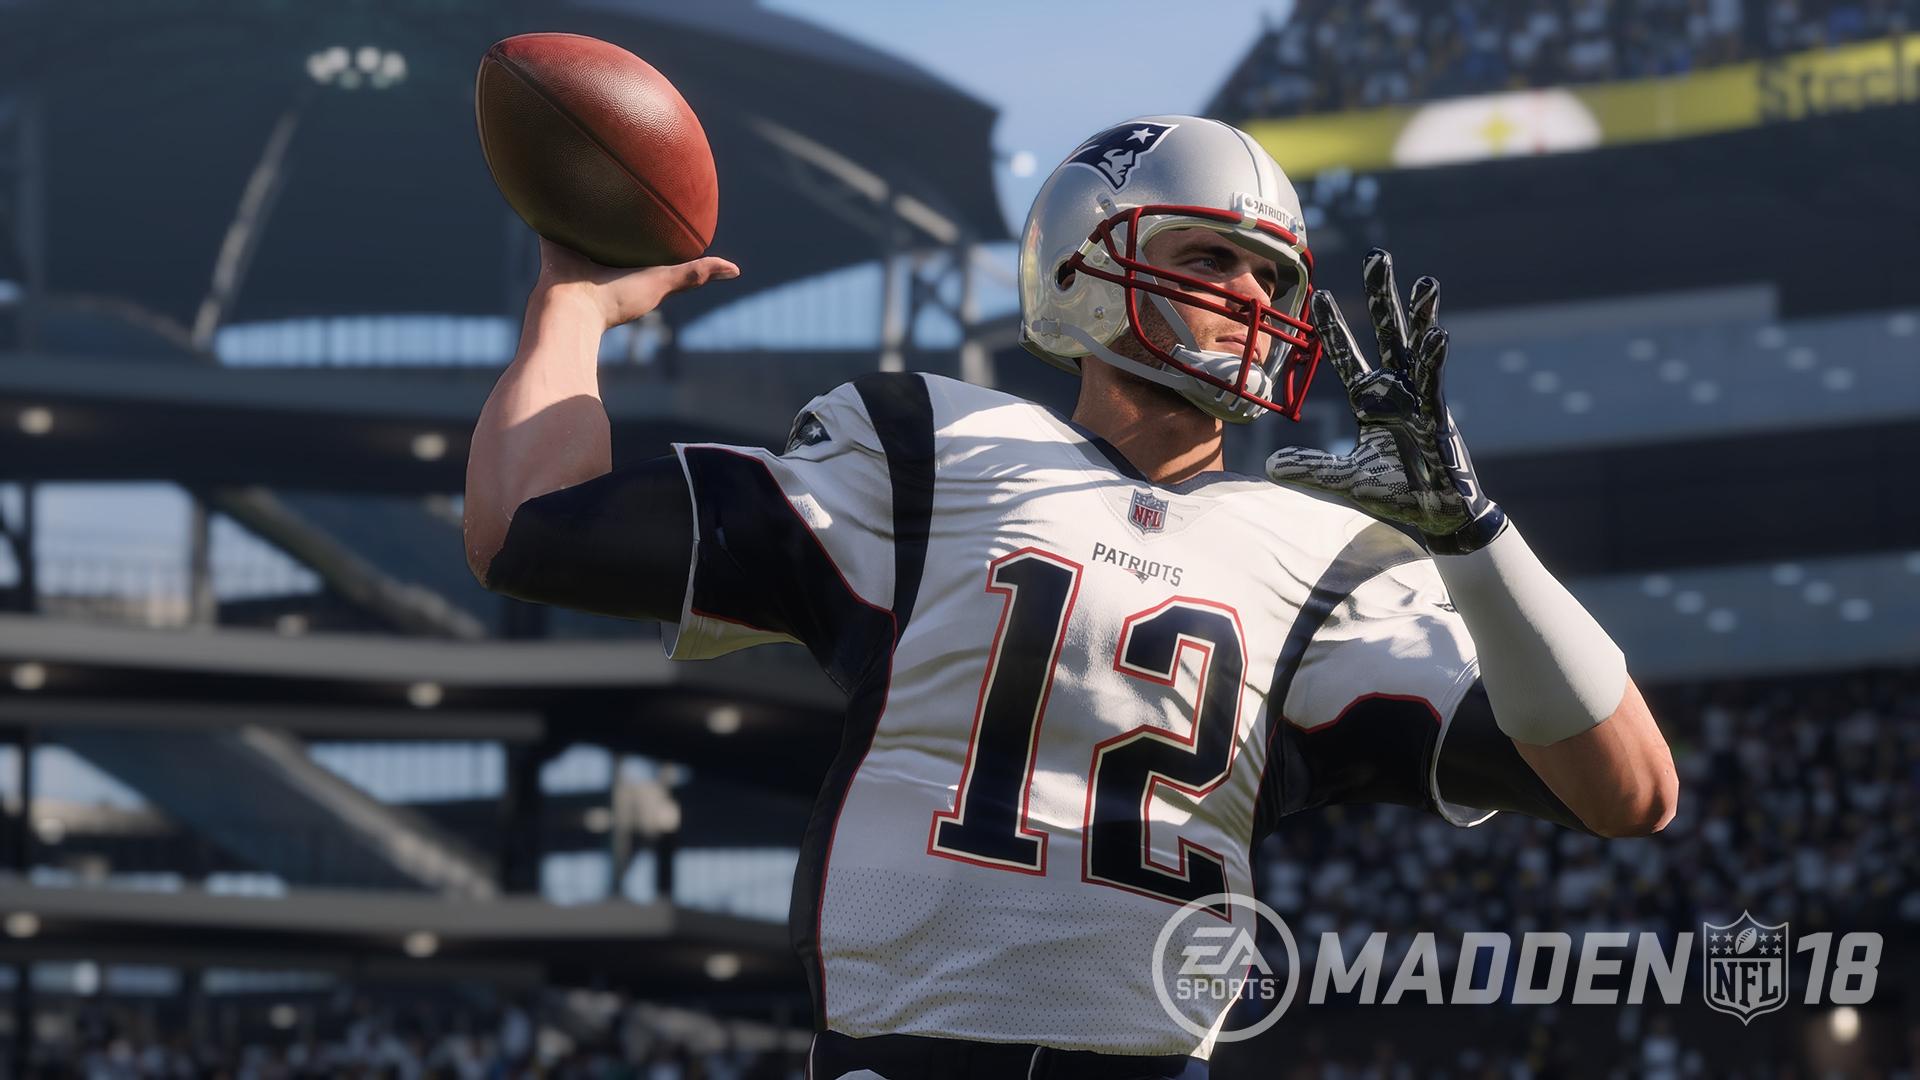 EA Sports Madden NFL game art of New England Patriots quarterback Tom Brady